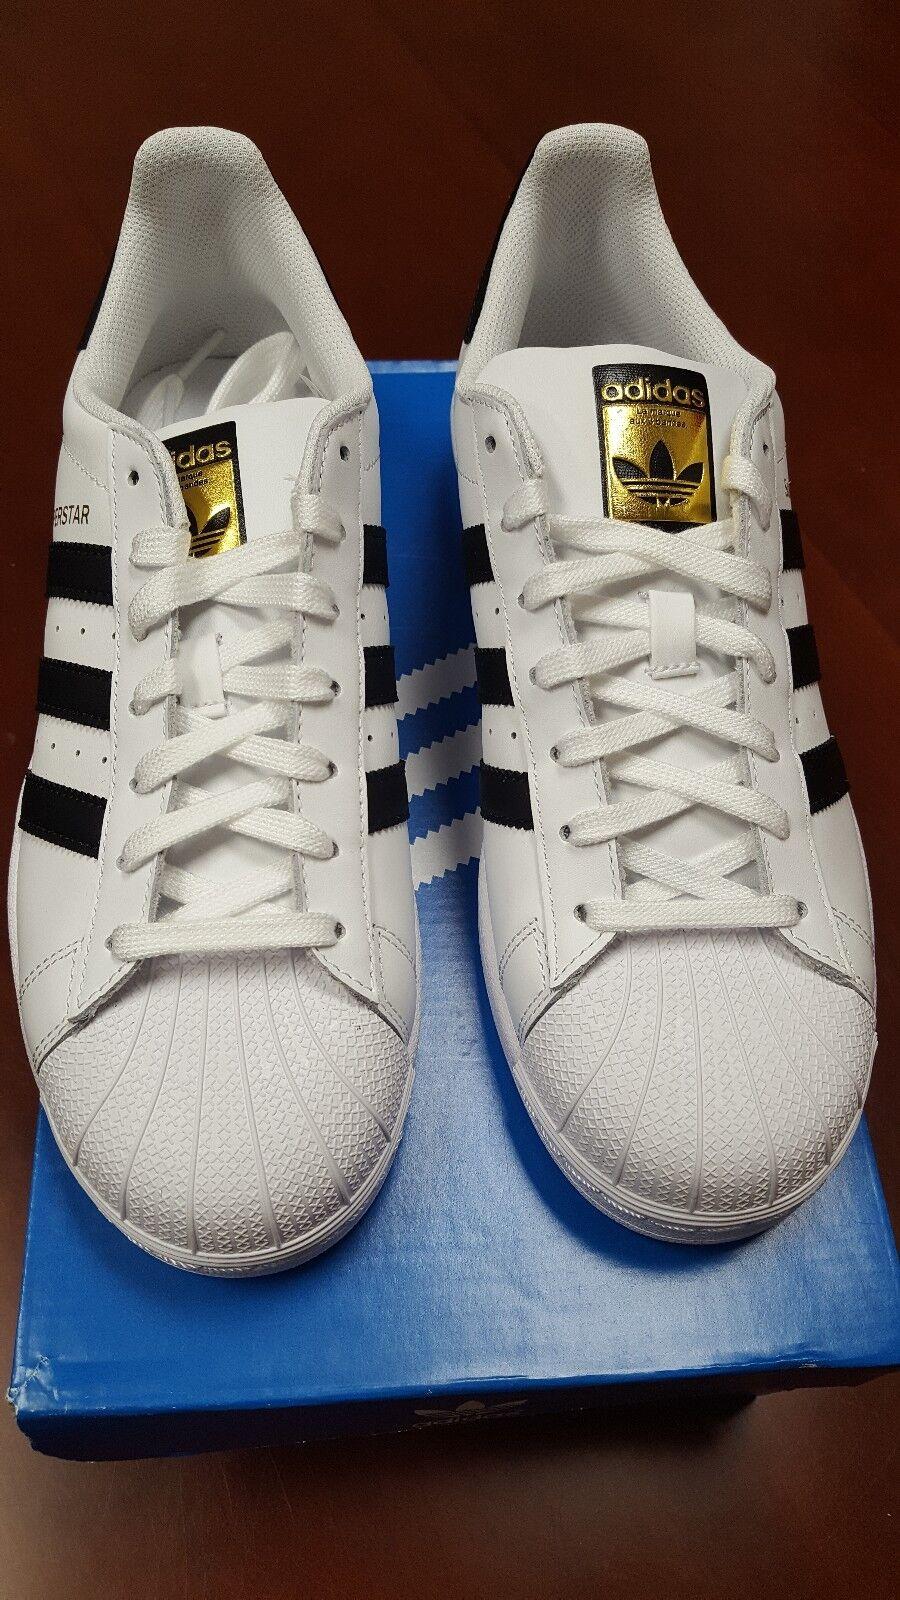 Adidas Adidas Adidas Originals Men's Superstar Sneakers White/Black b0fb29